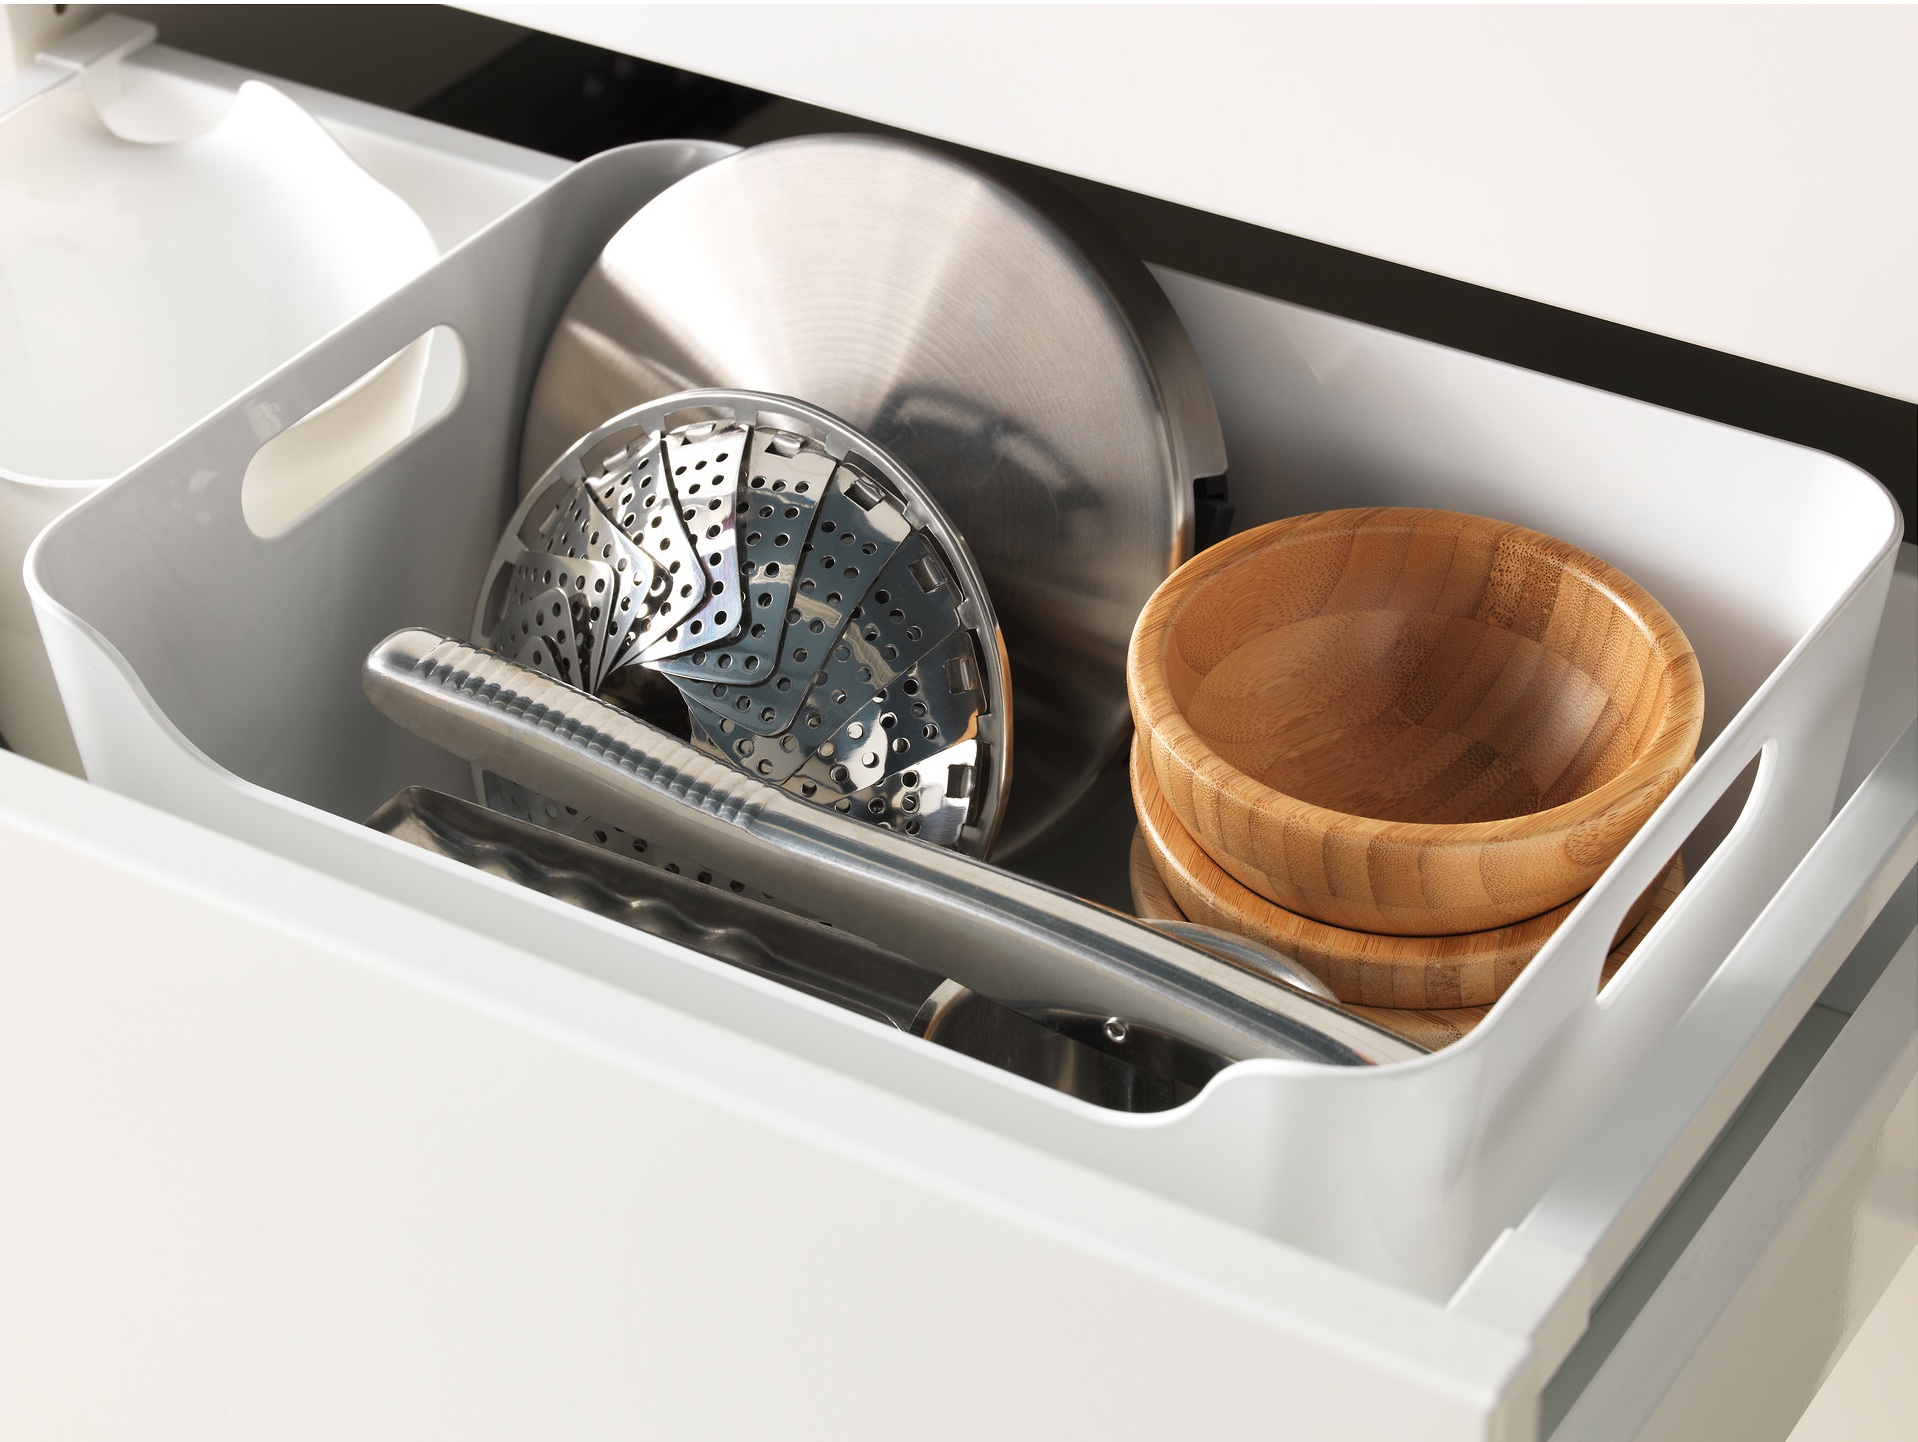 Emejing contenitori cucina ikea gallery home interior ideas - Ikea contenitori cucina ...